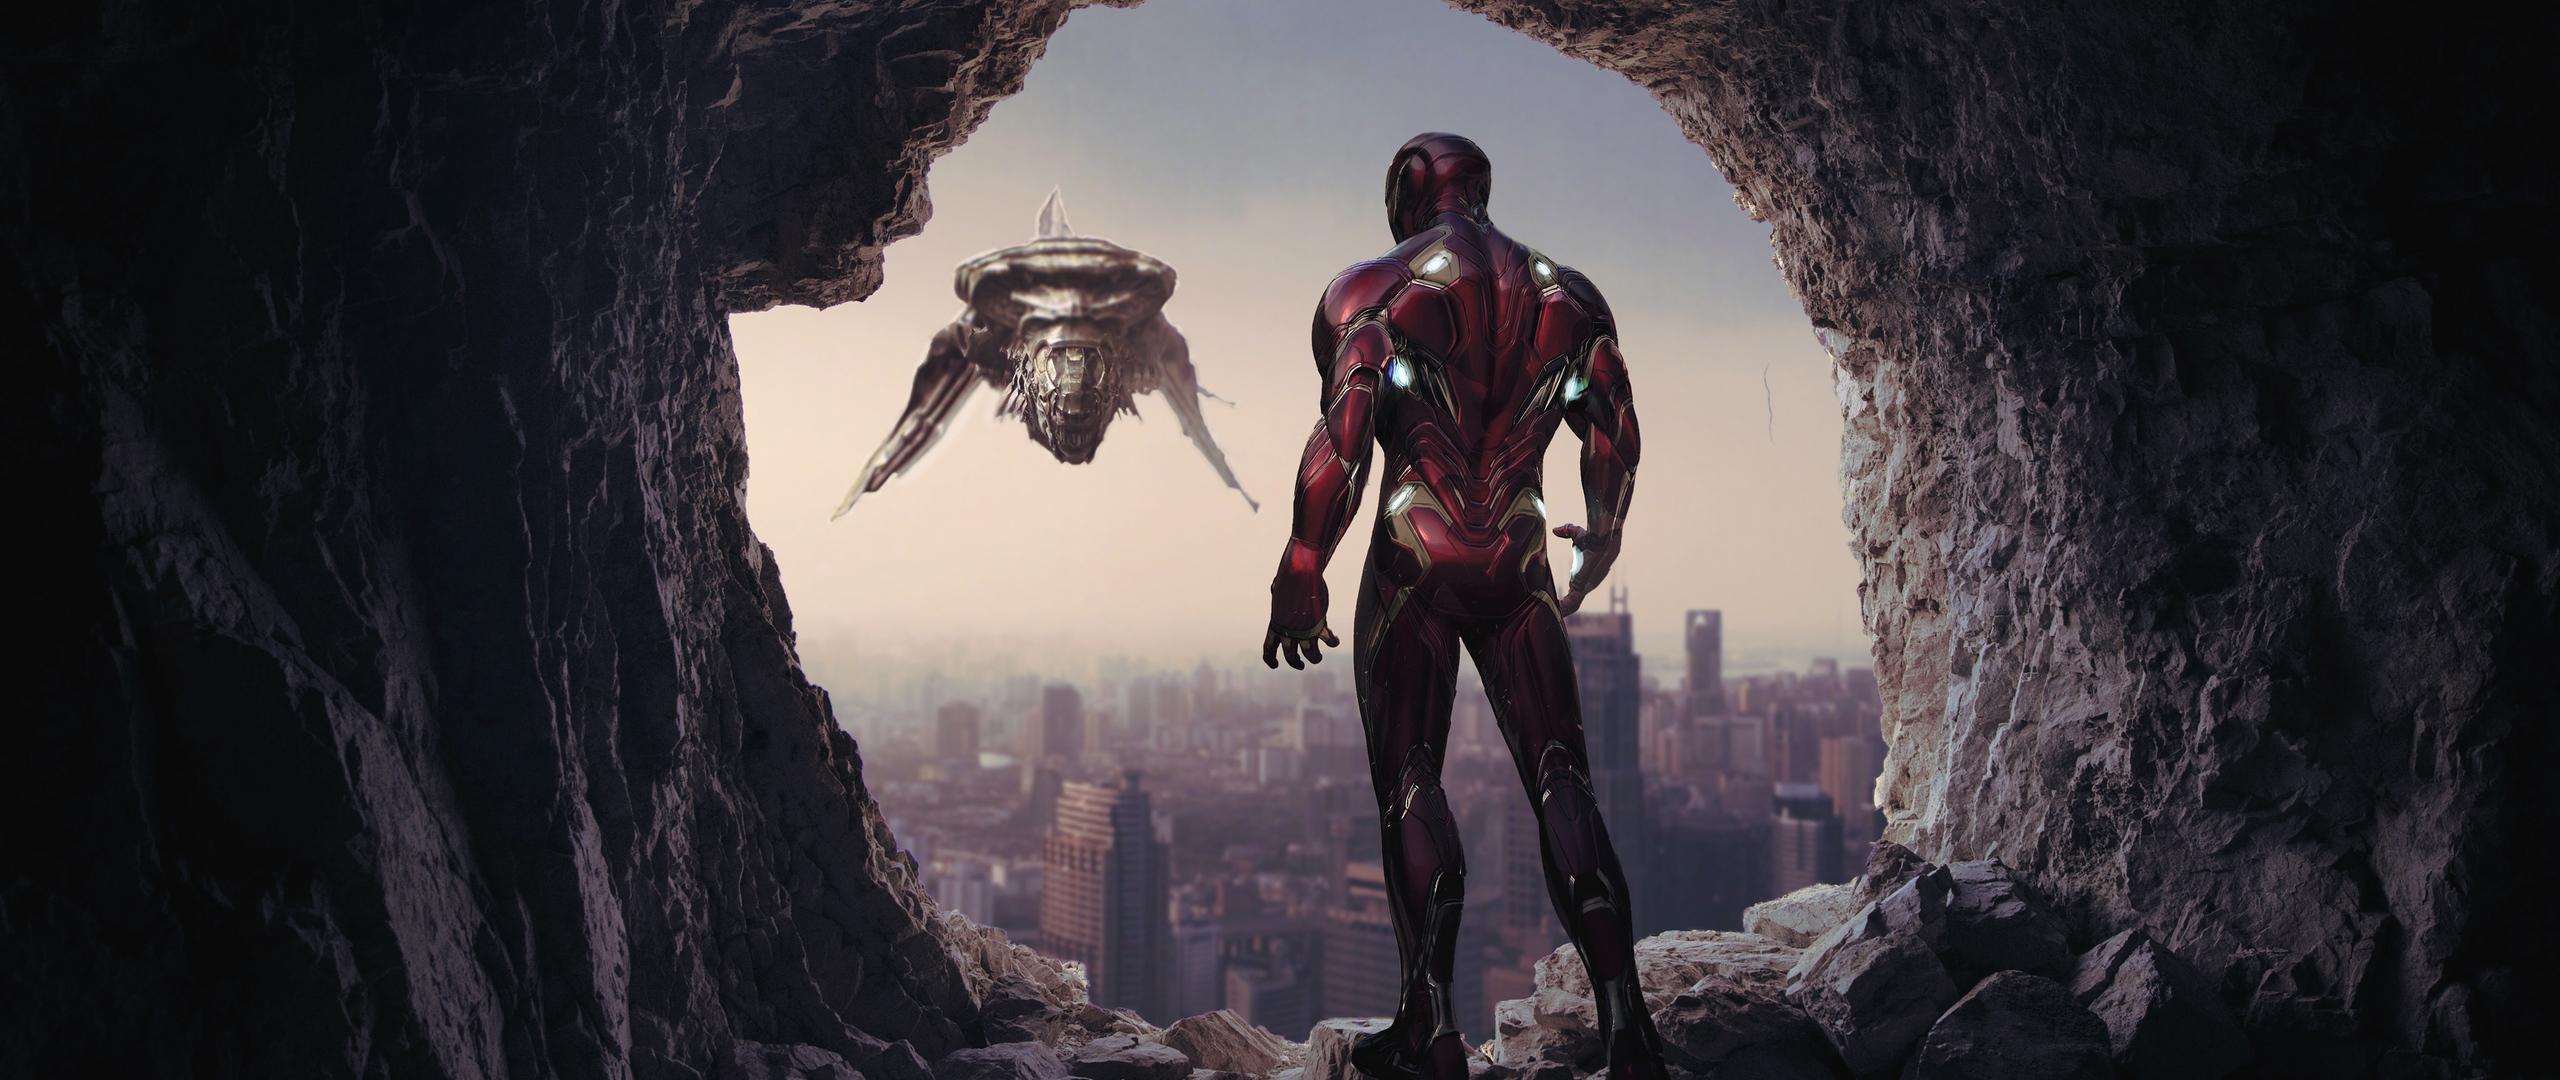 iron-man-avengers-endgame-4k-lost-world-rw.jpg